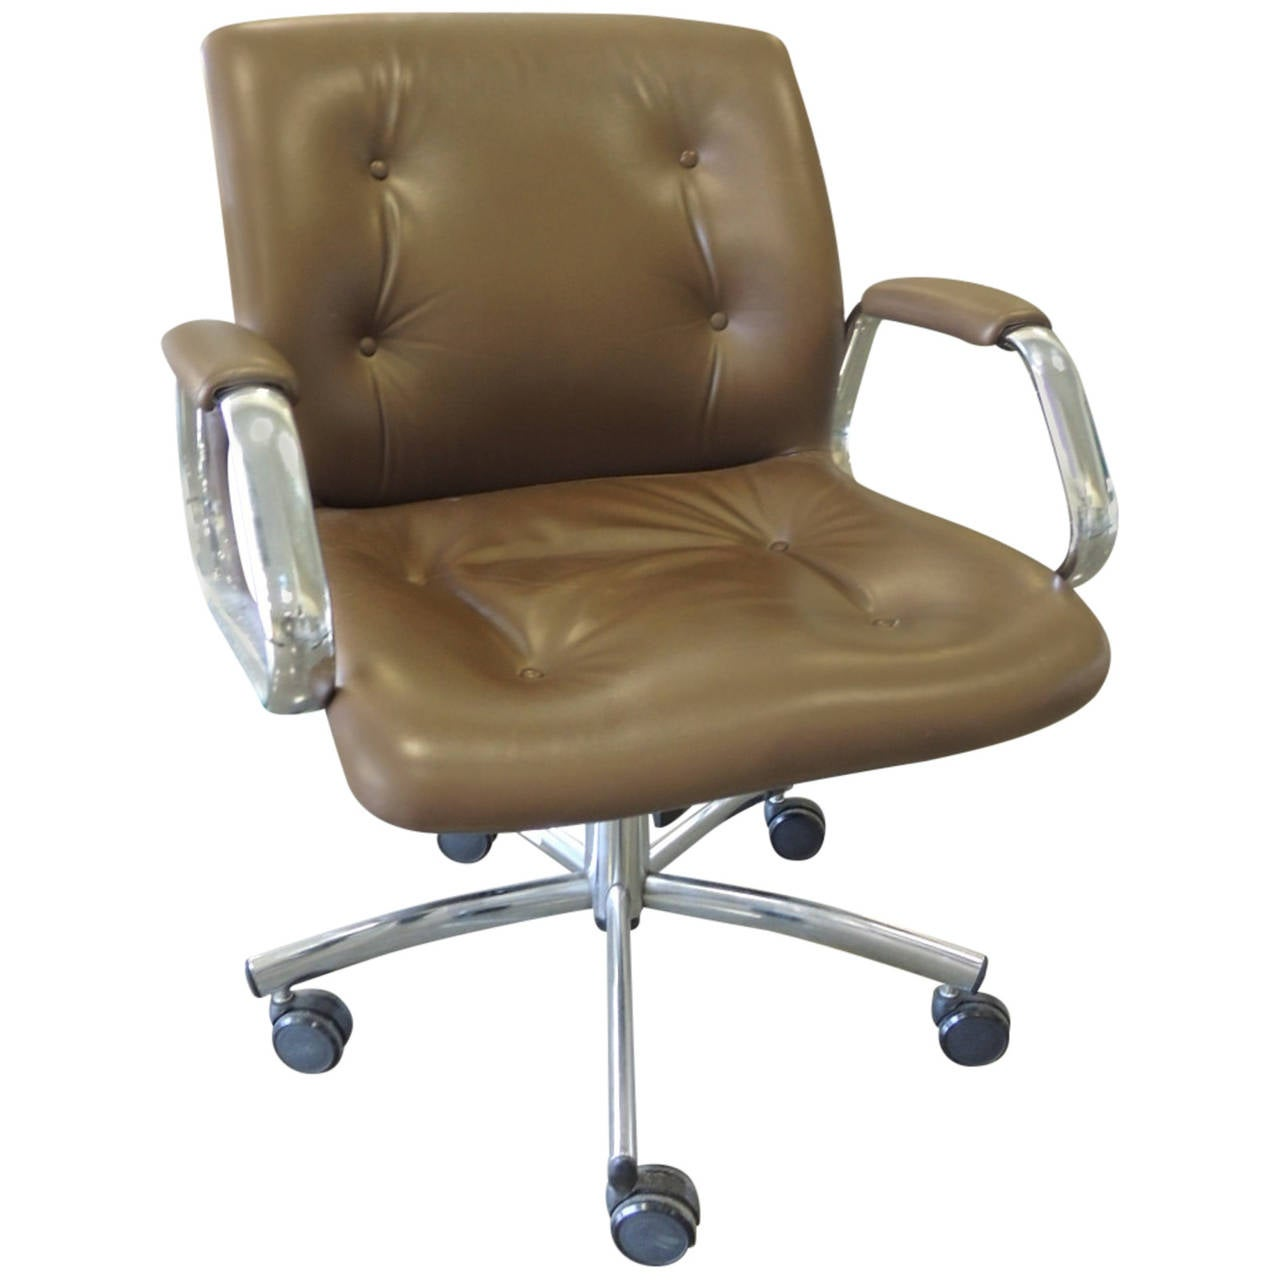 desk chair utm wood rocking office at 1stdibs